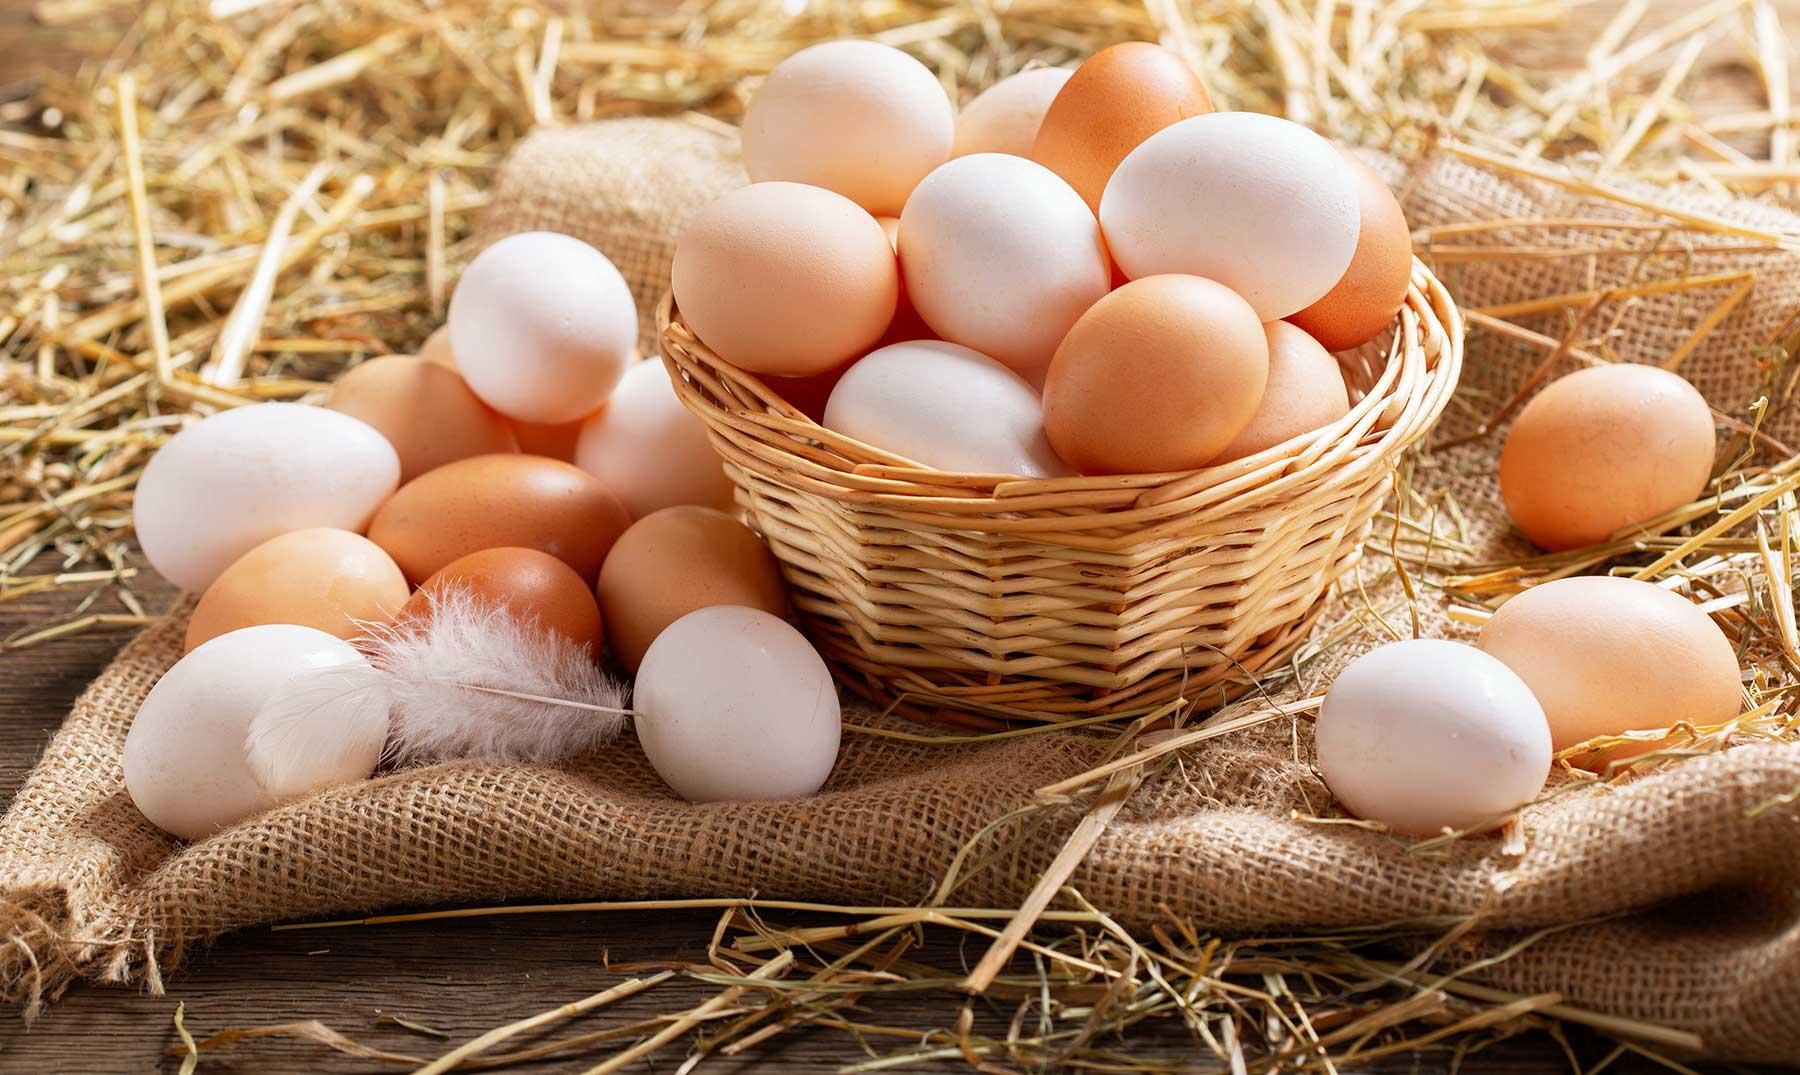 como saber si un huevo esta en buen estado